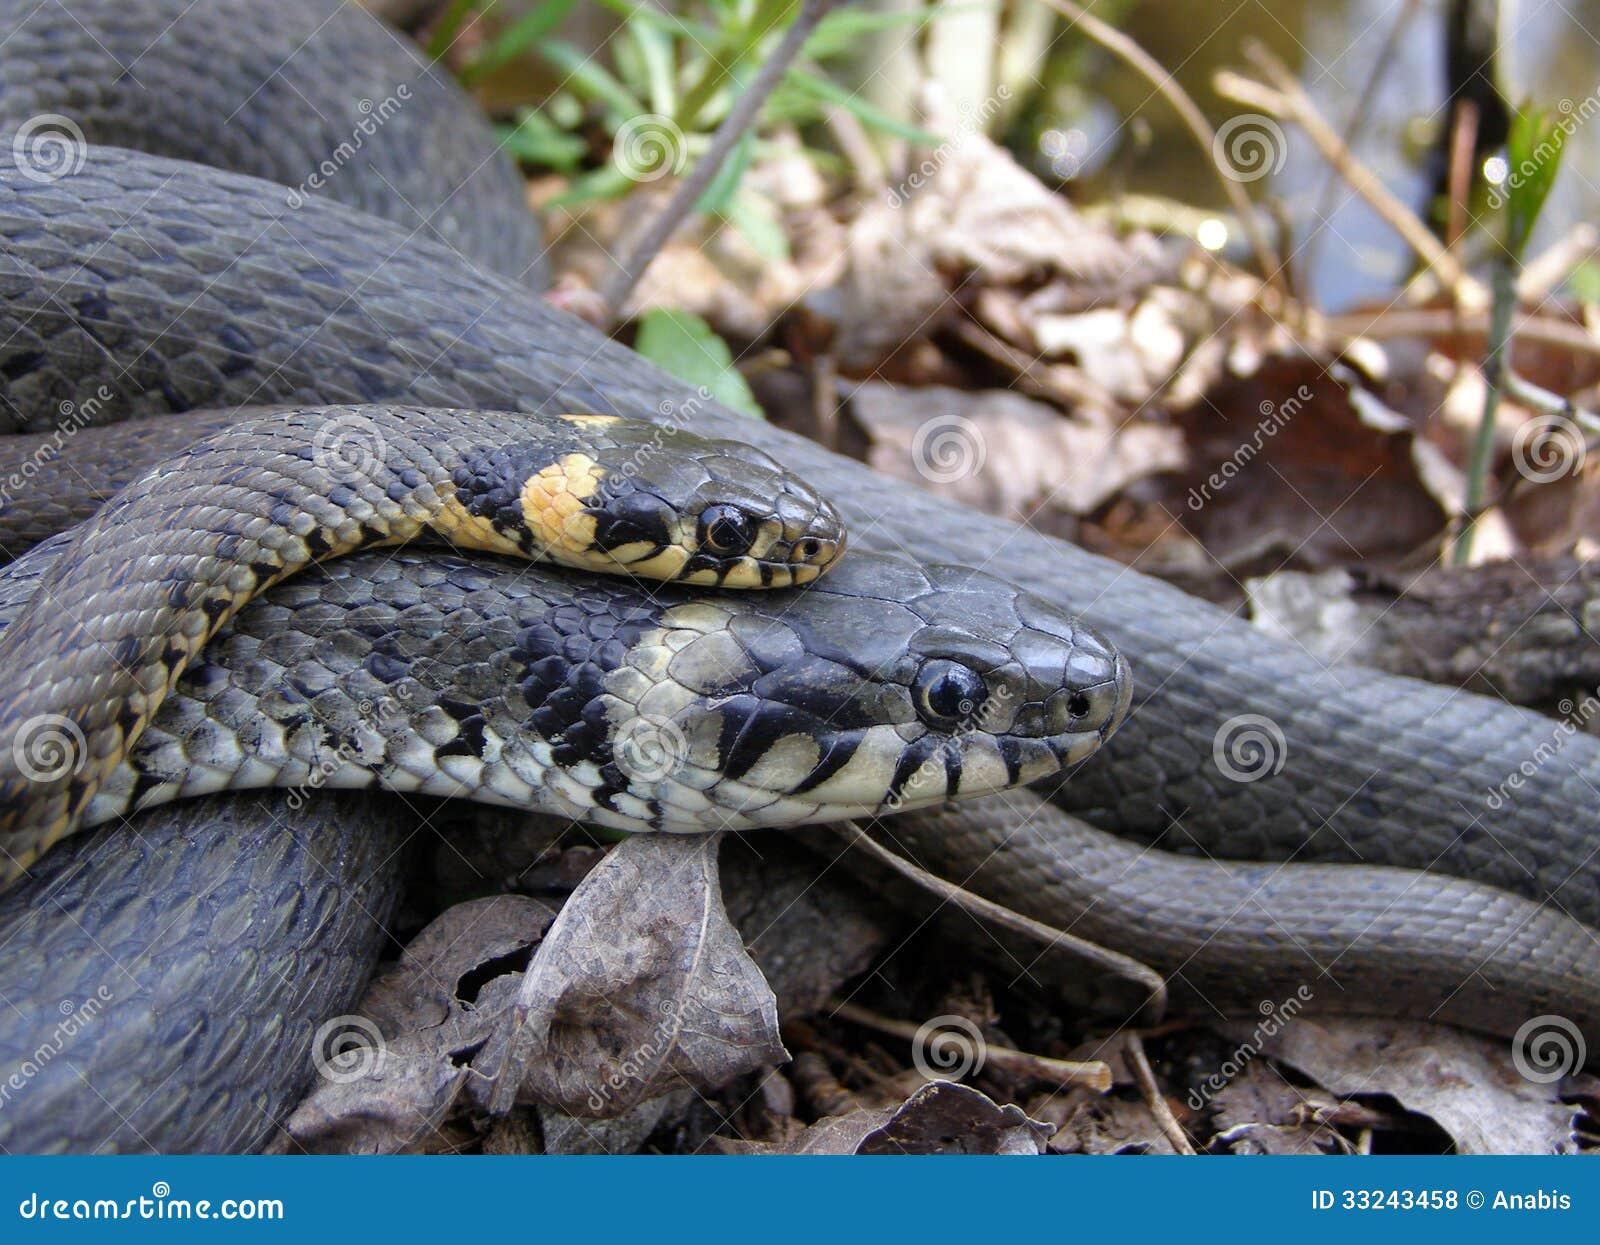 grass snakes mating royalty free stock photos image 33243458